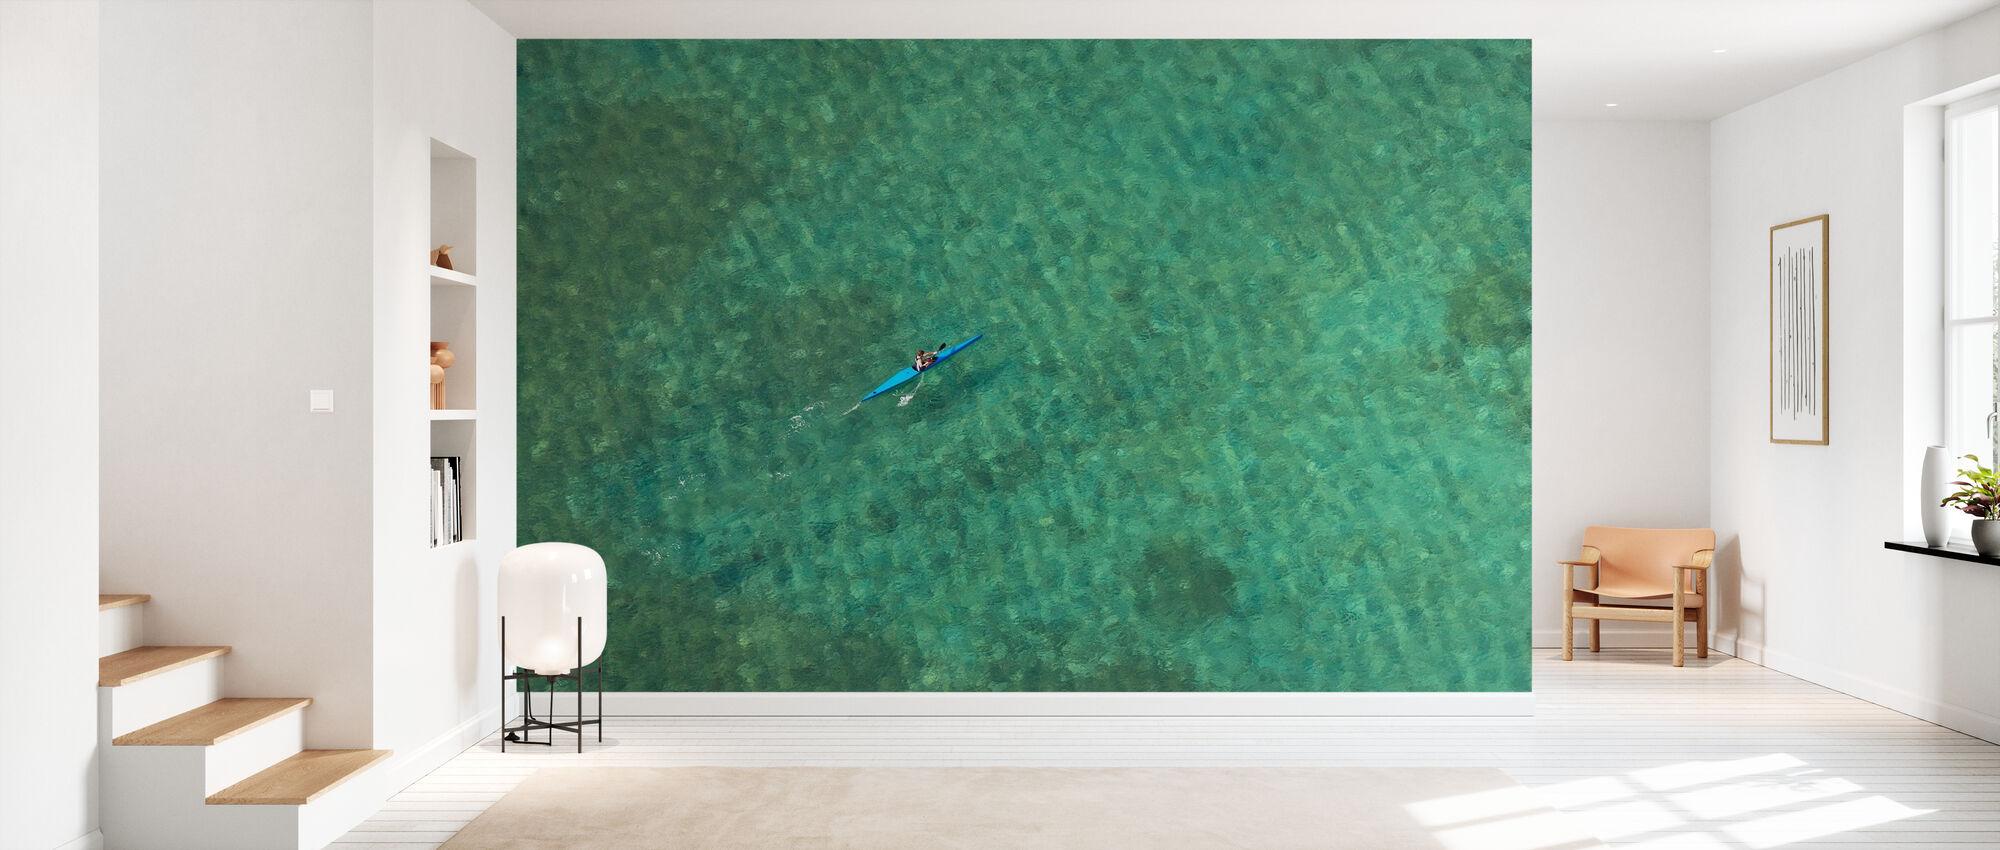 Alone in the Atlantic - Wallpaper - Hallway